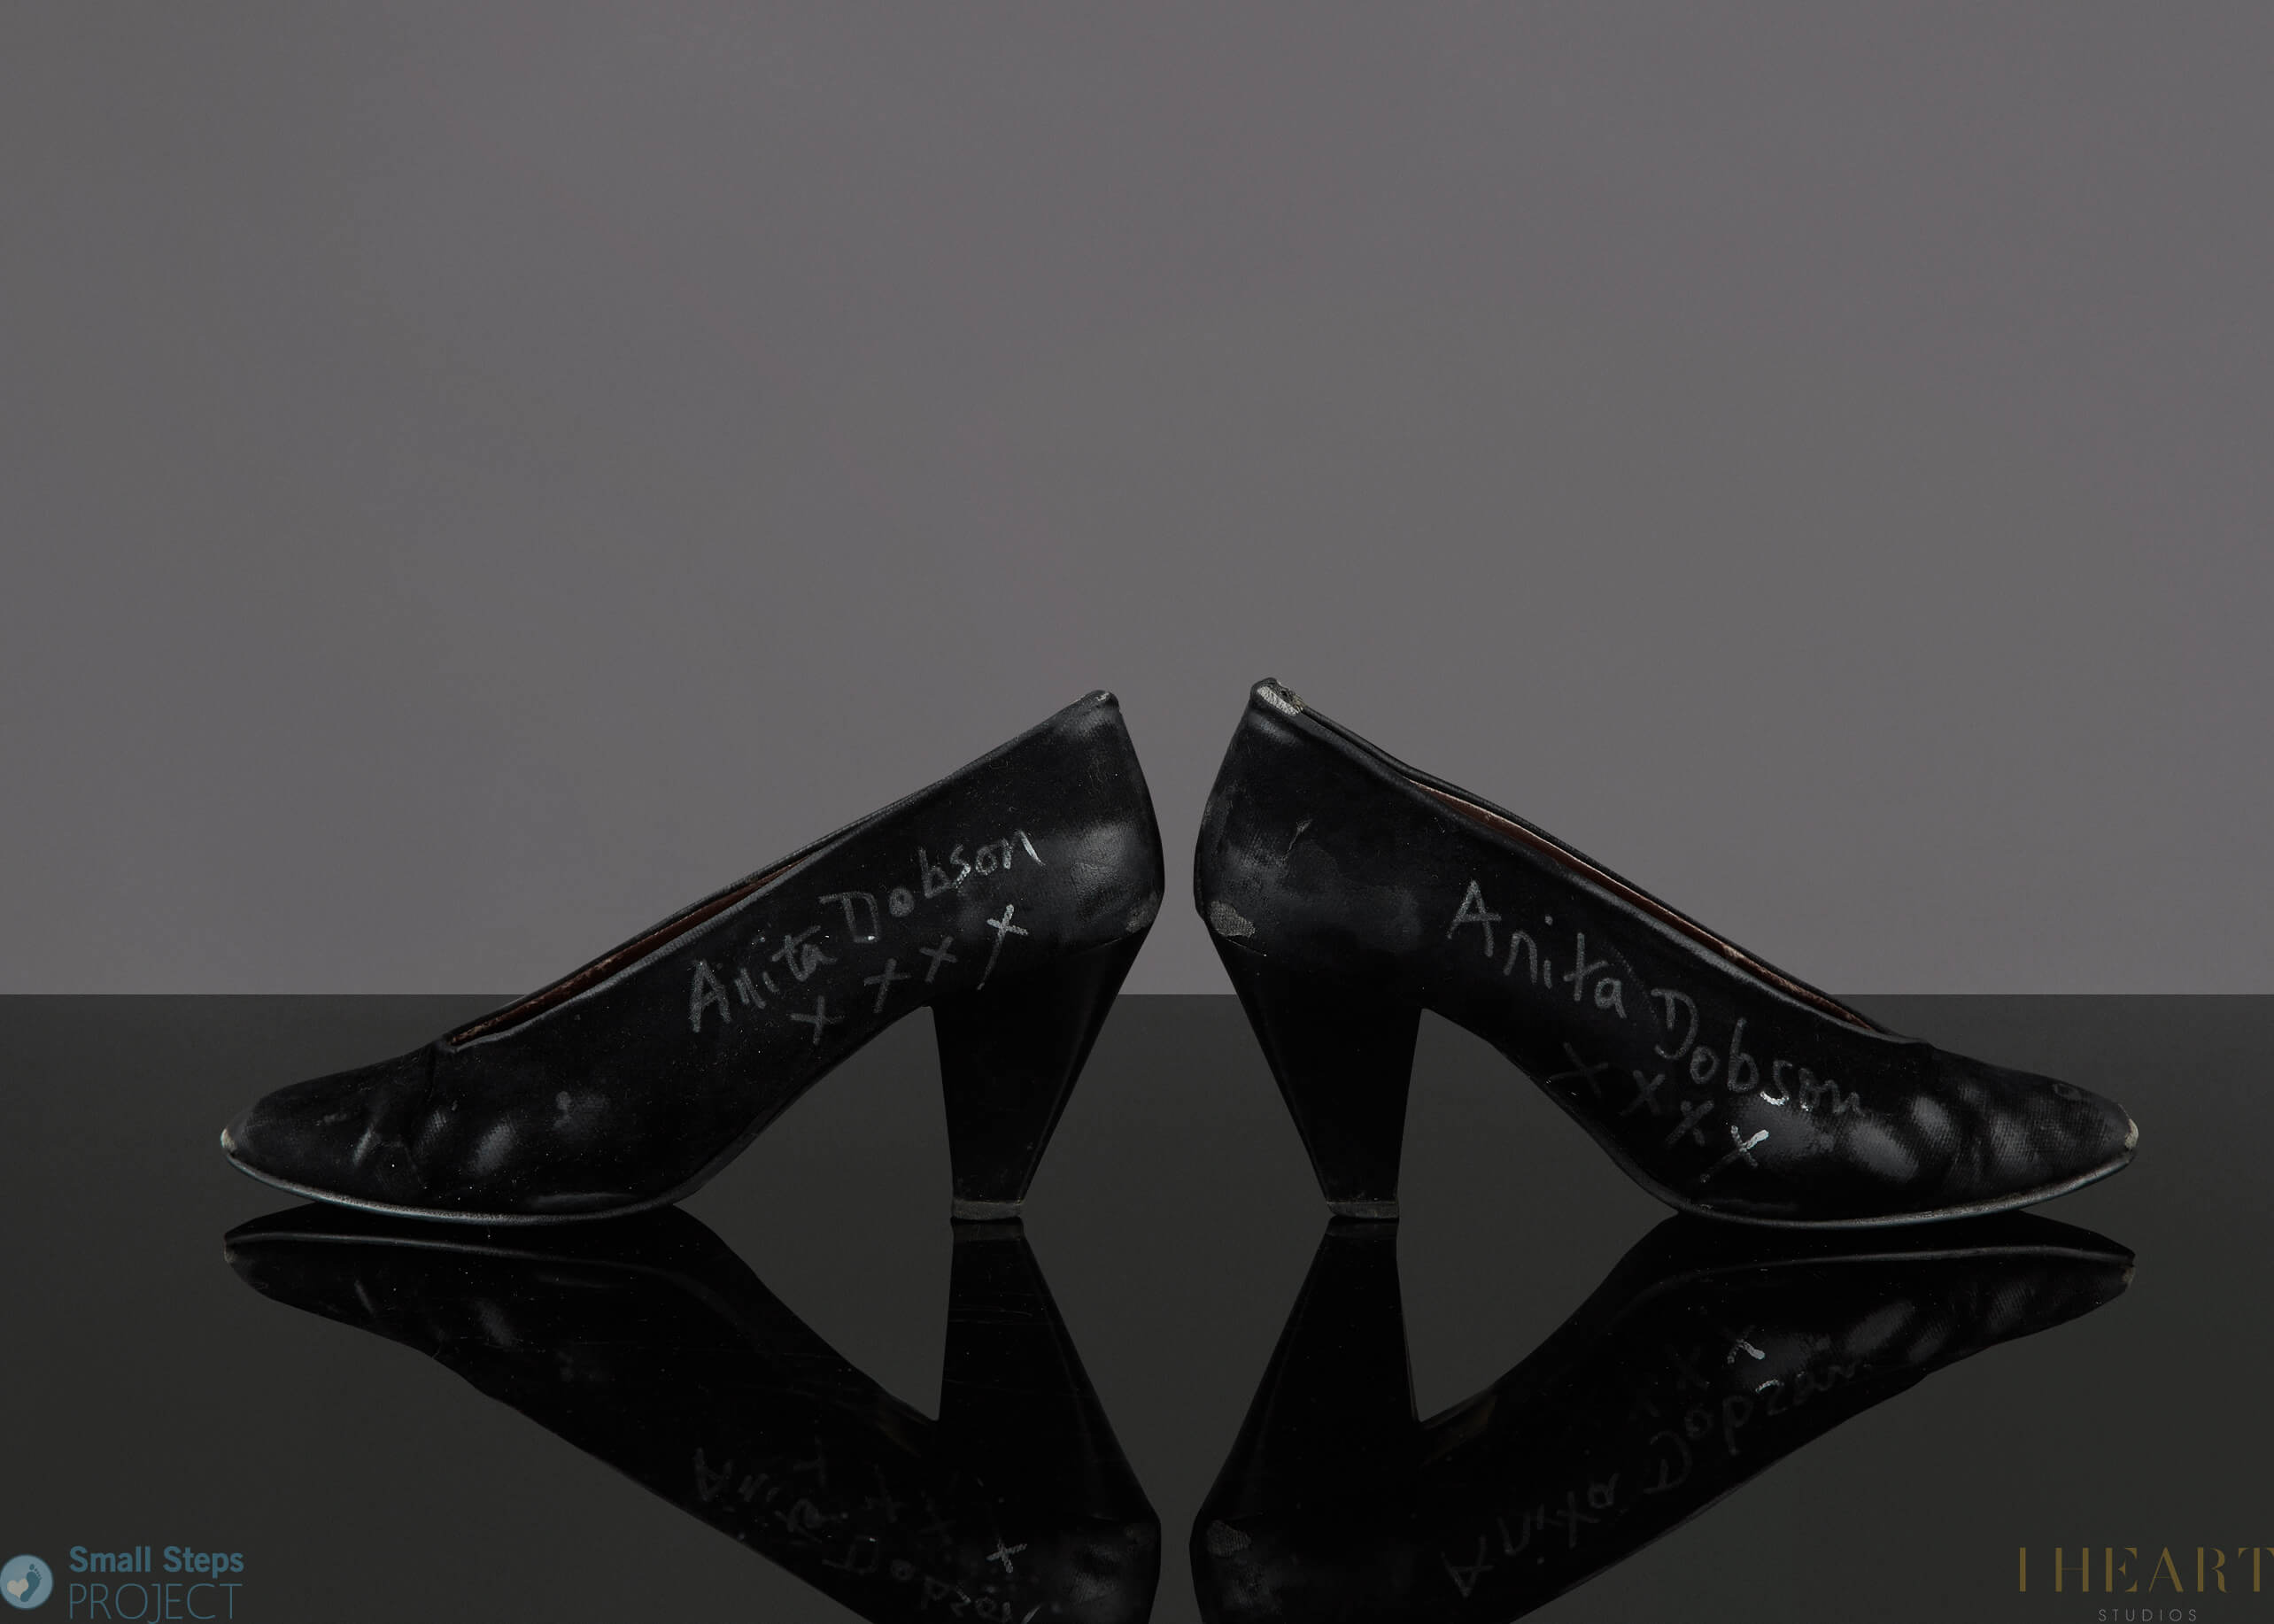 Anita Dobson's 2014 shoe donation.